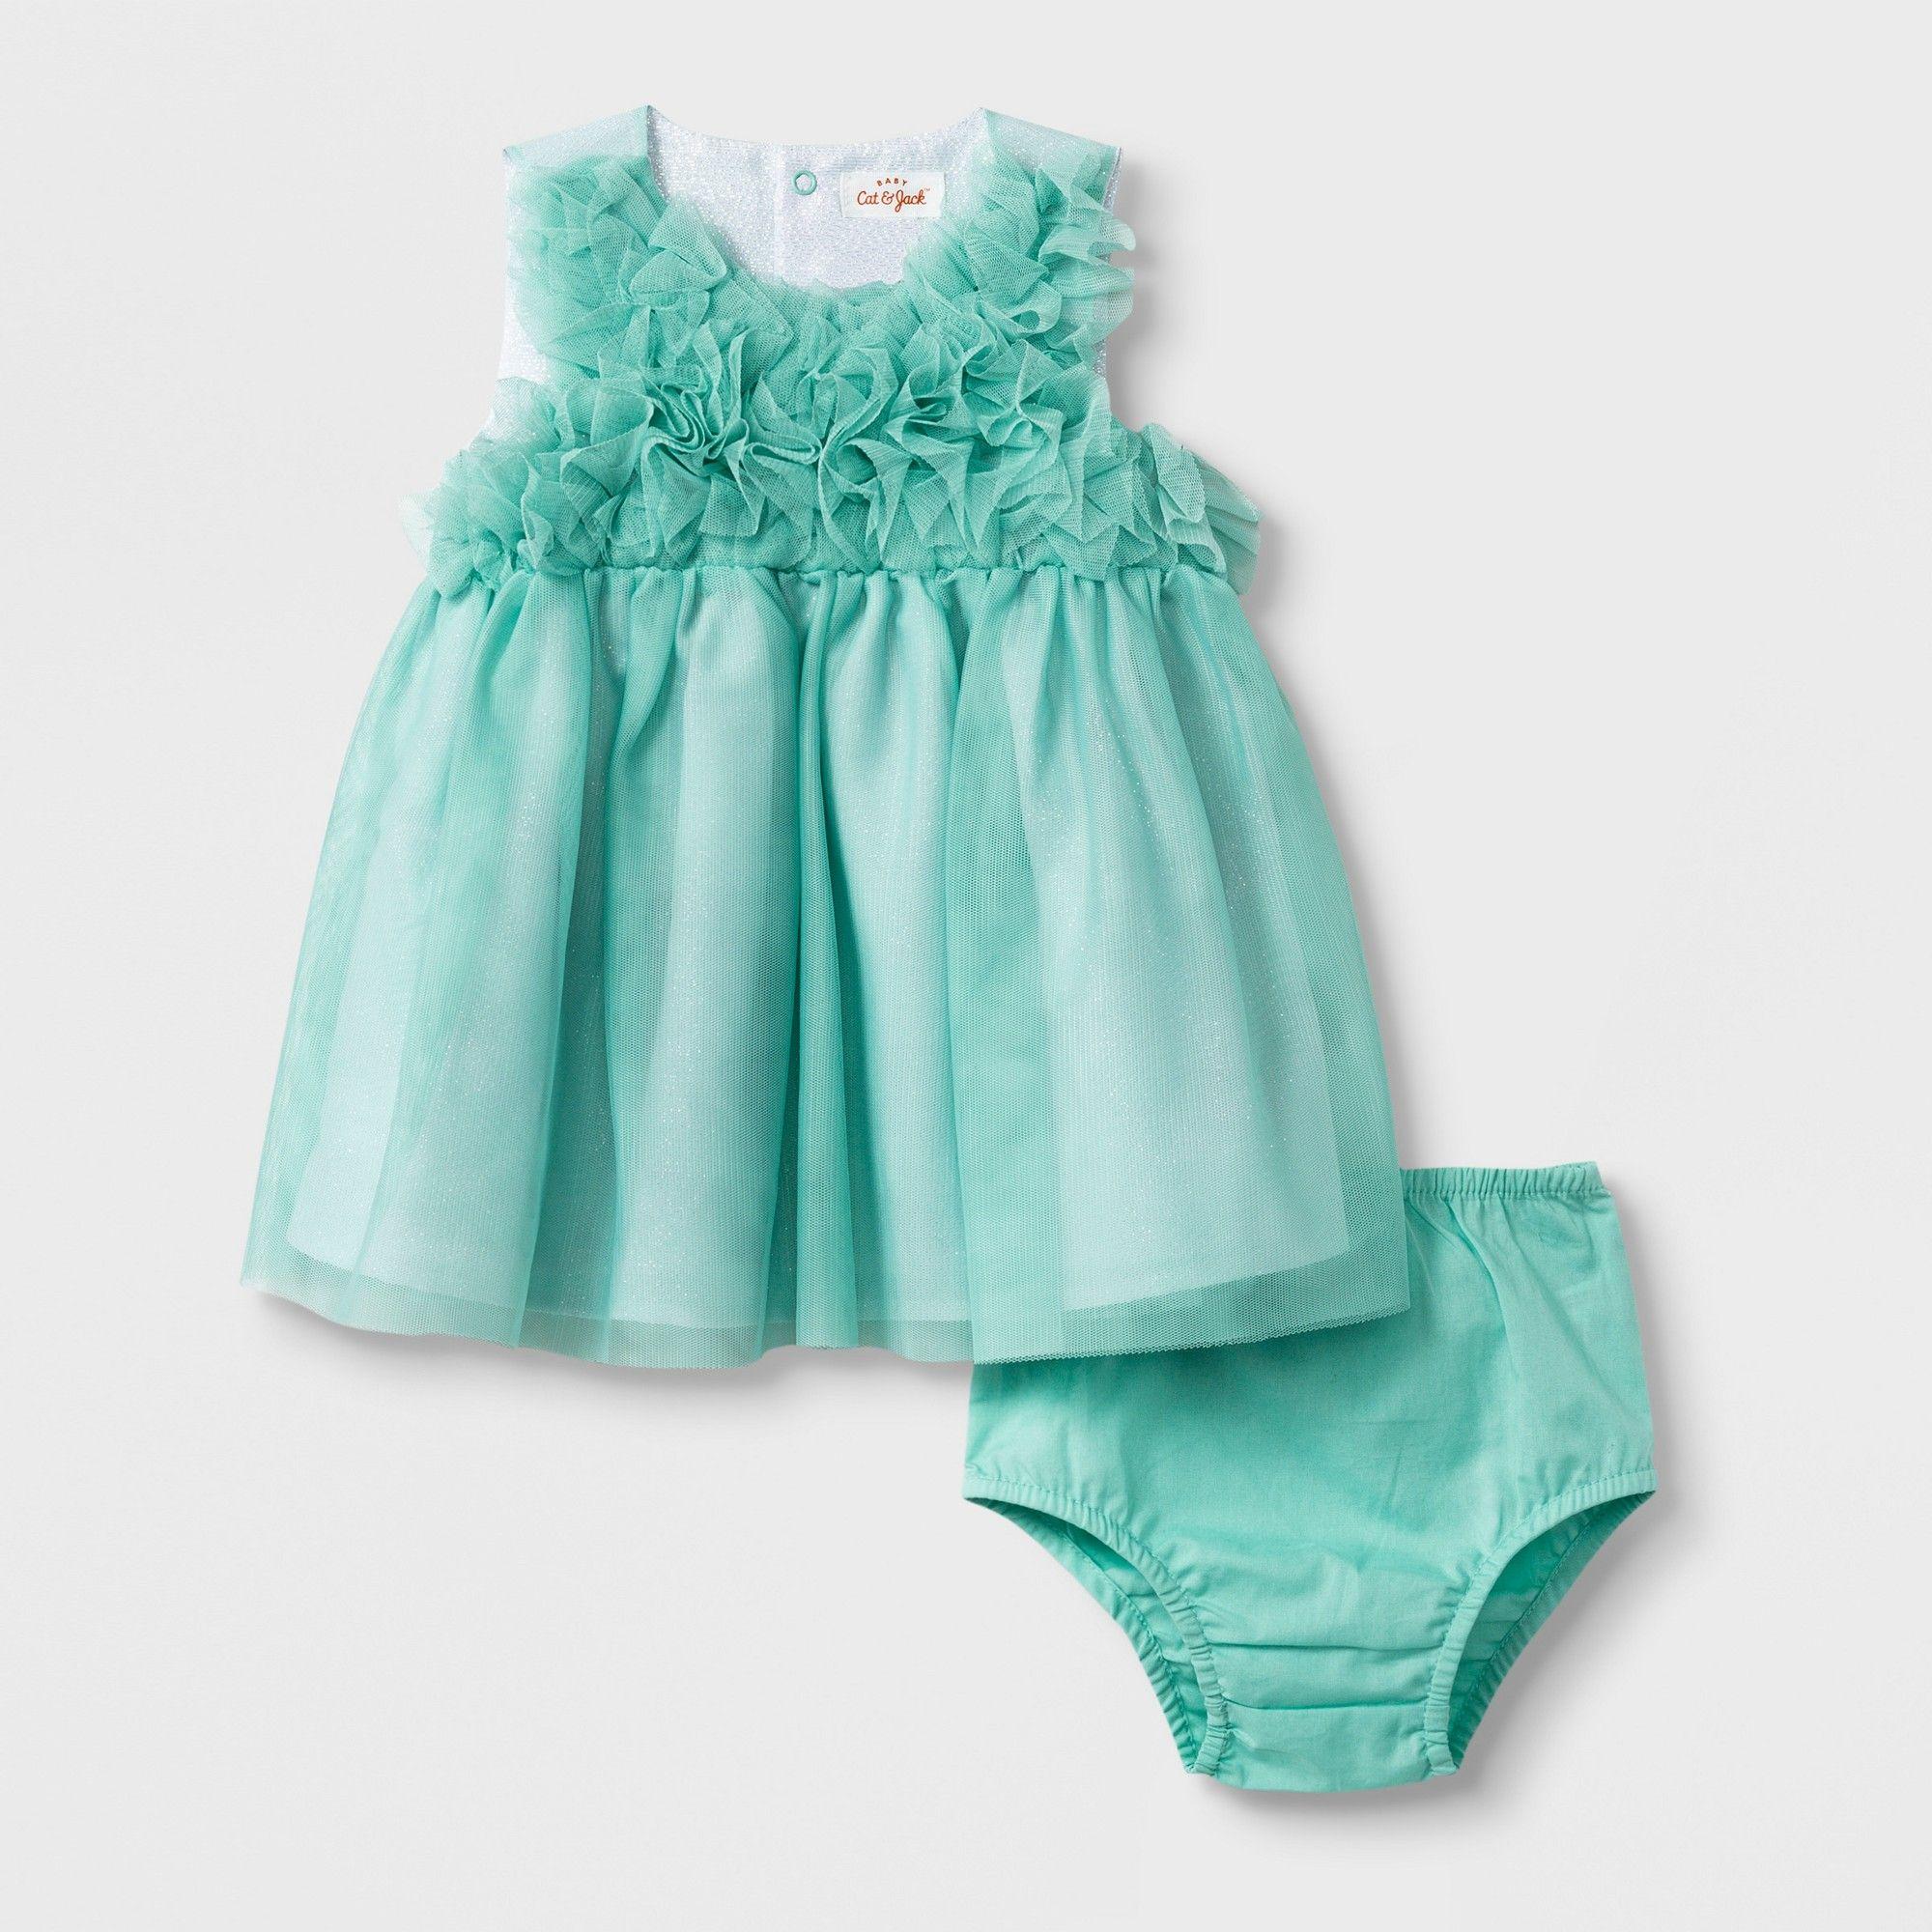 8efe0ea6c5 Baby Girls' Ruffle Bodice Dress - Cat & Jack Alpine Green 24M ...